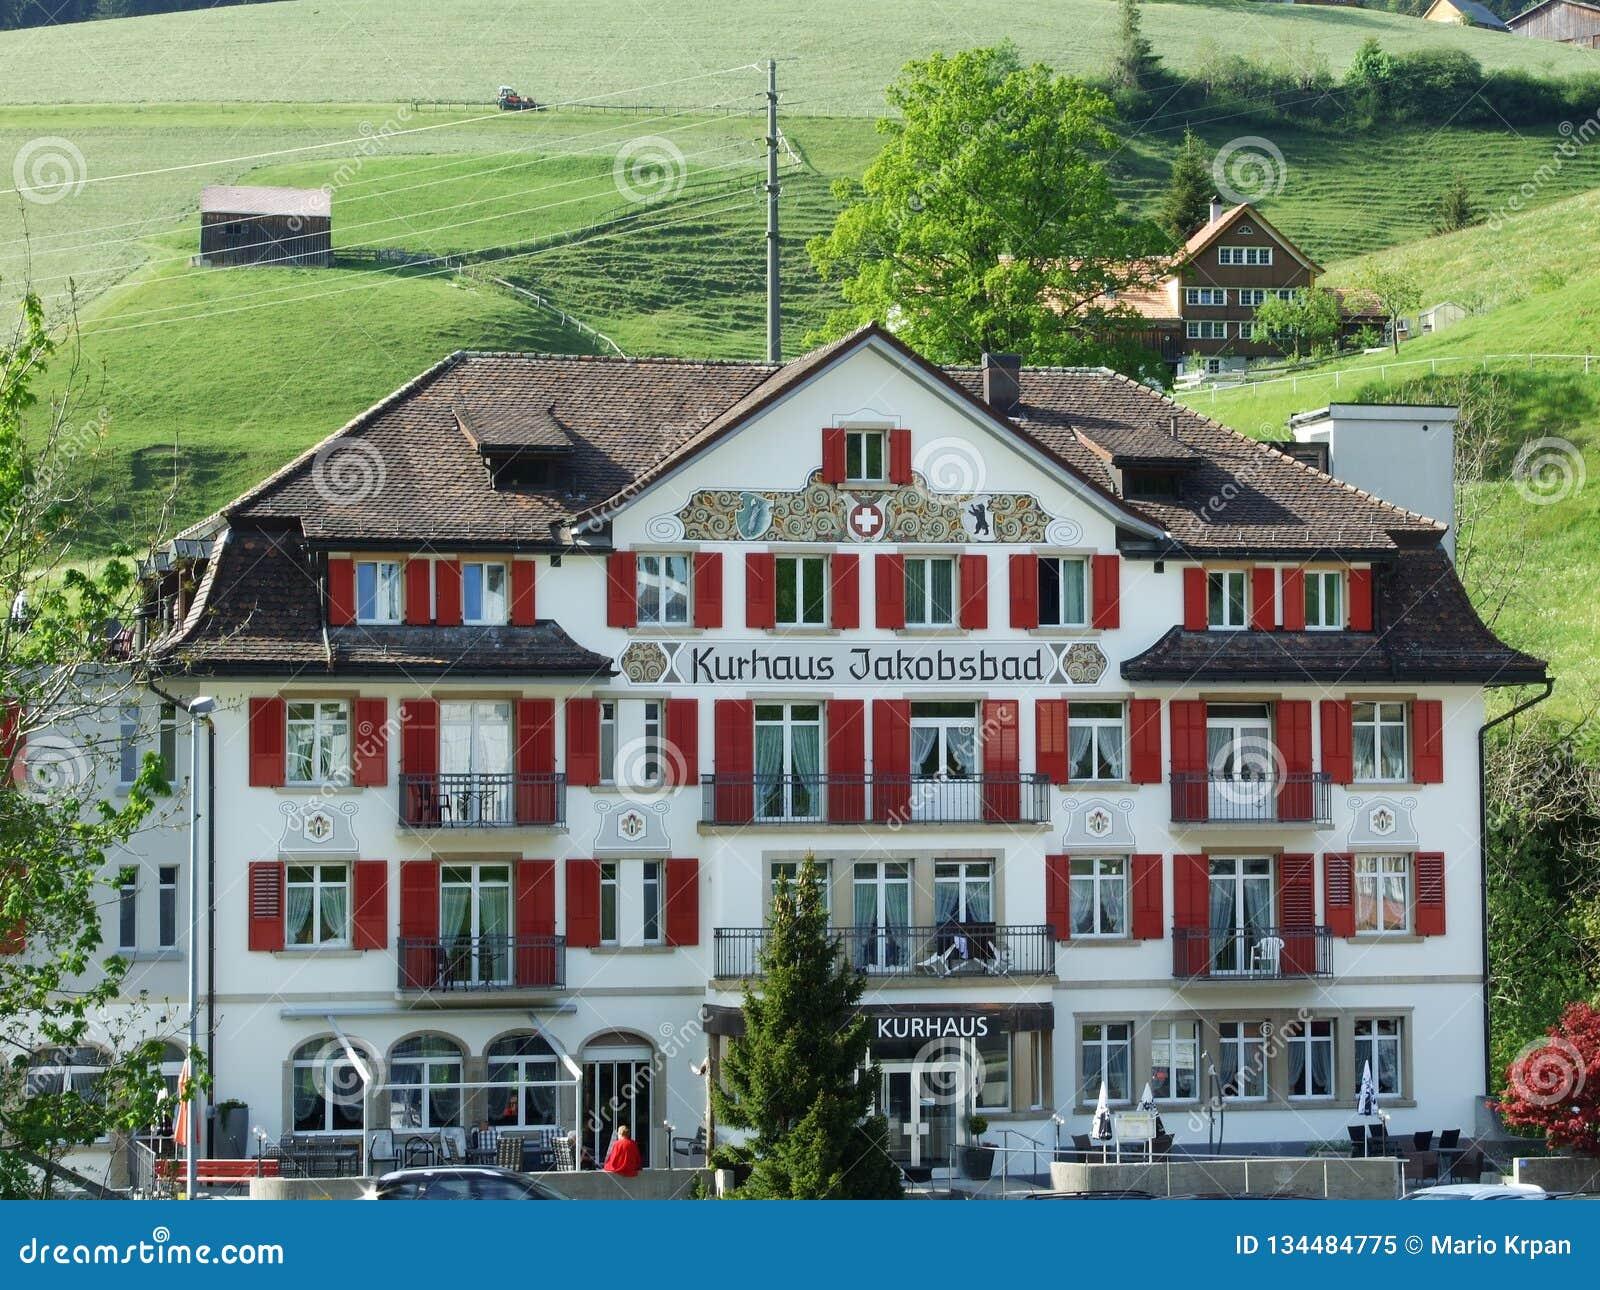 Hotel Kurhaus Jakobsbad In Jakobsbad Editorial Image